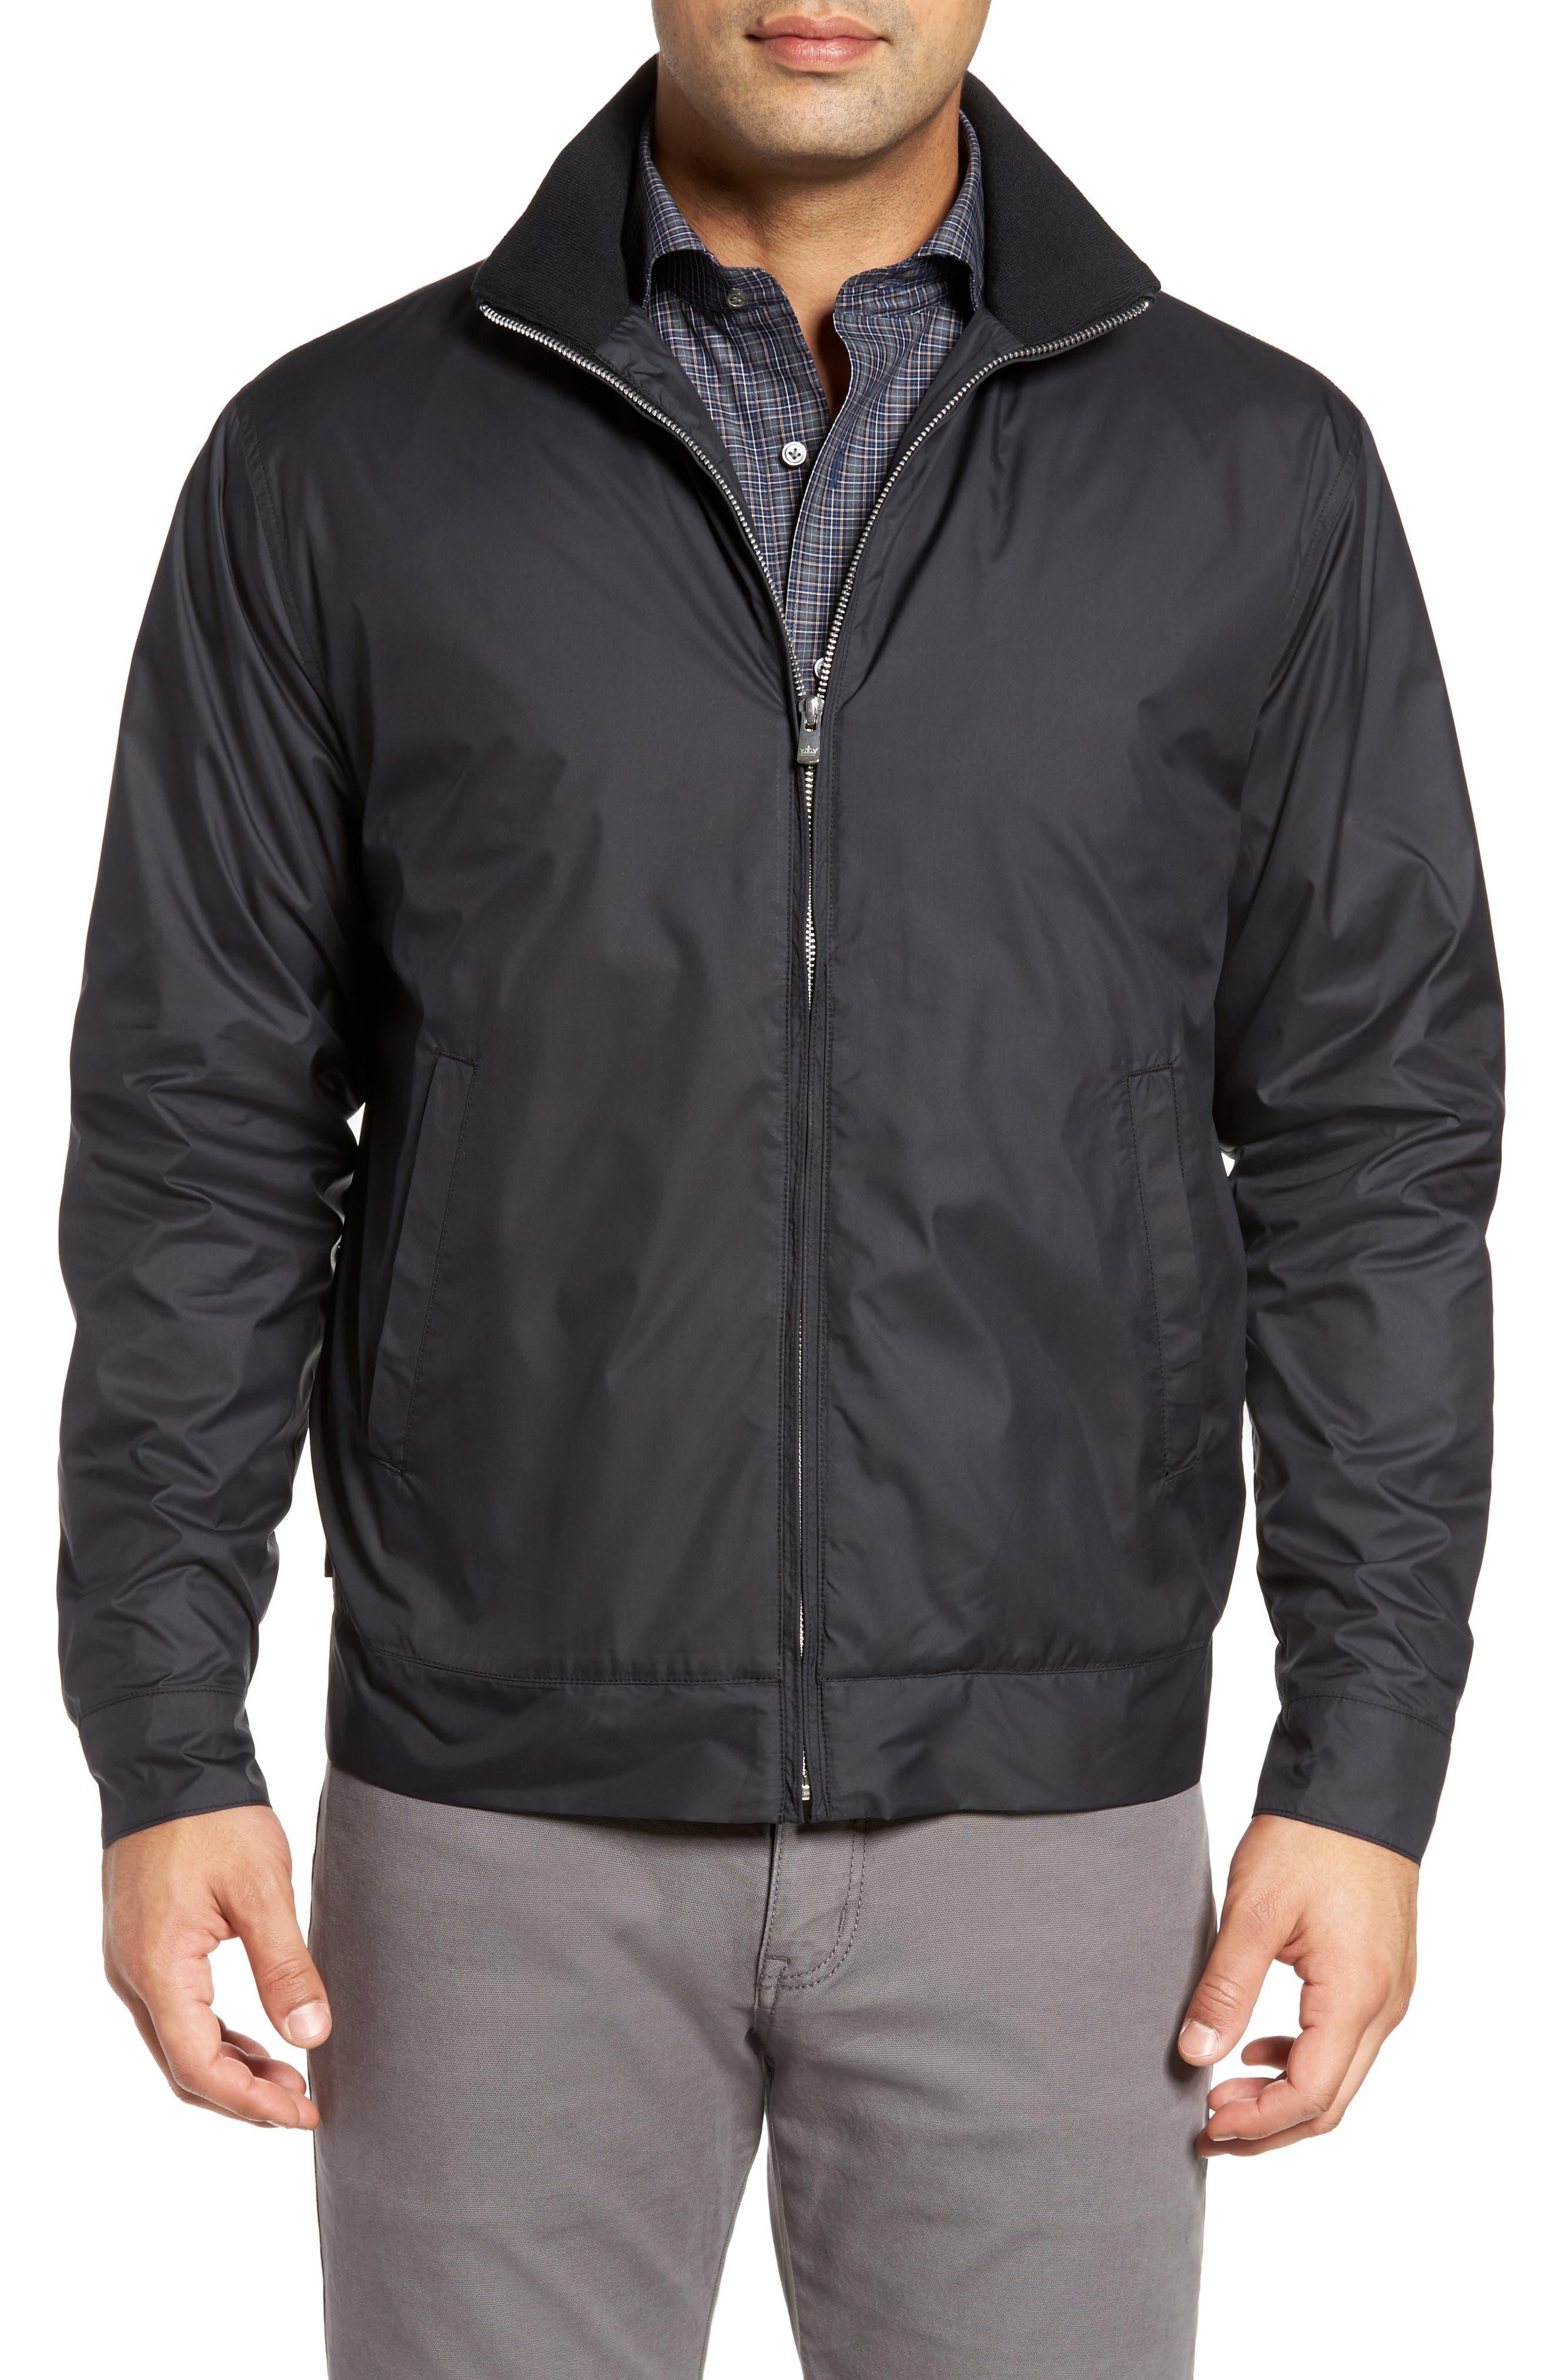 Zip Jacket,                             Main thumbnail 1, color,                             BLACK